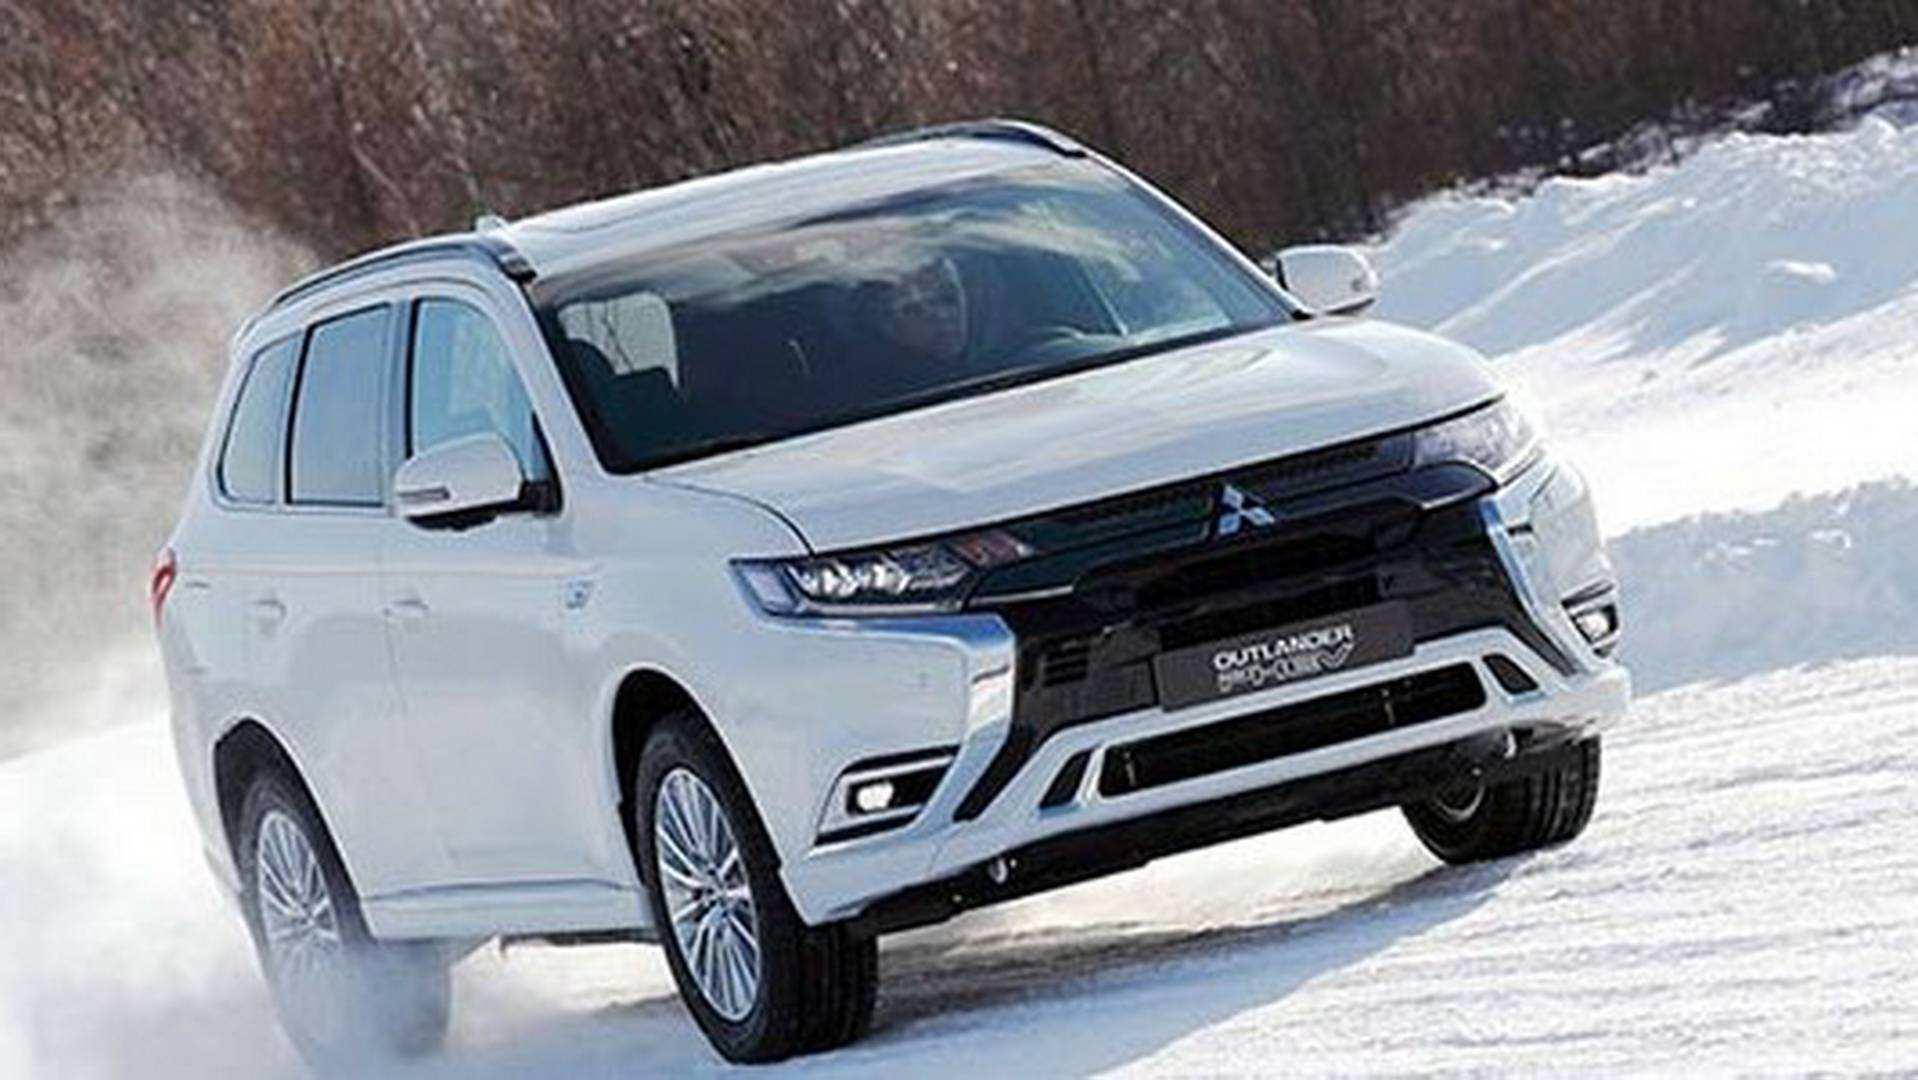 14 New 2019 Mitsubishi Crossover Redesign by 2019 Mitsubishi Crossover